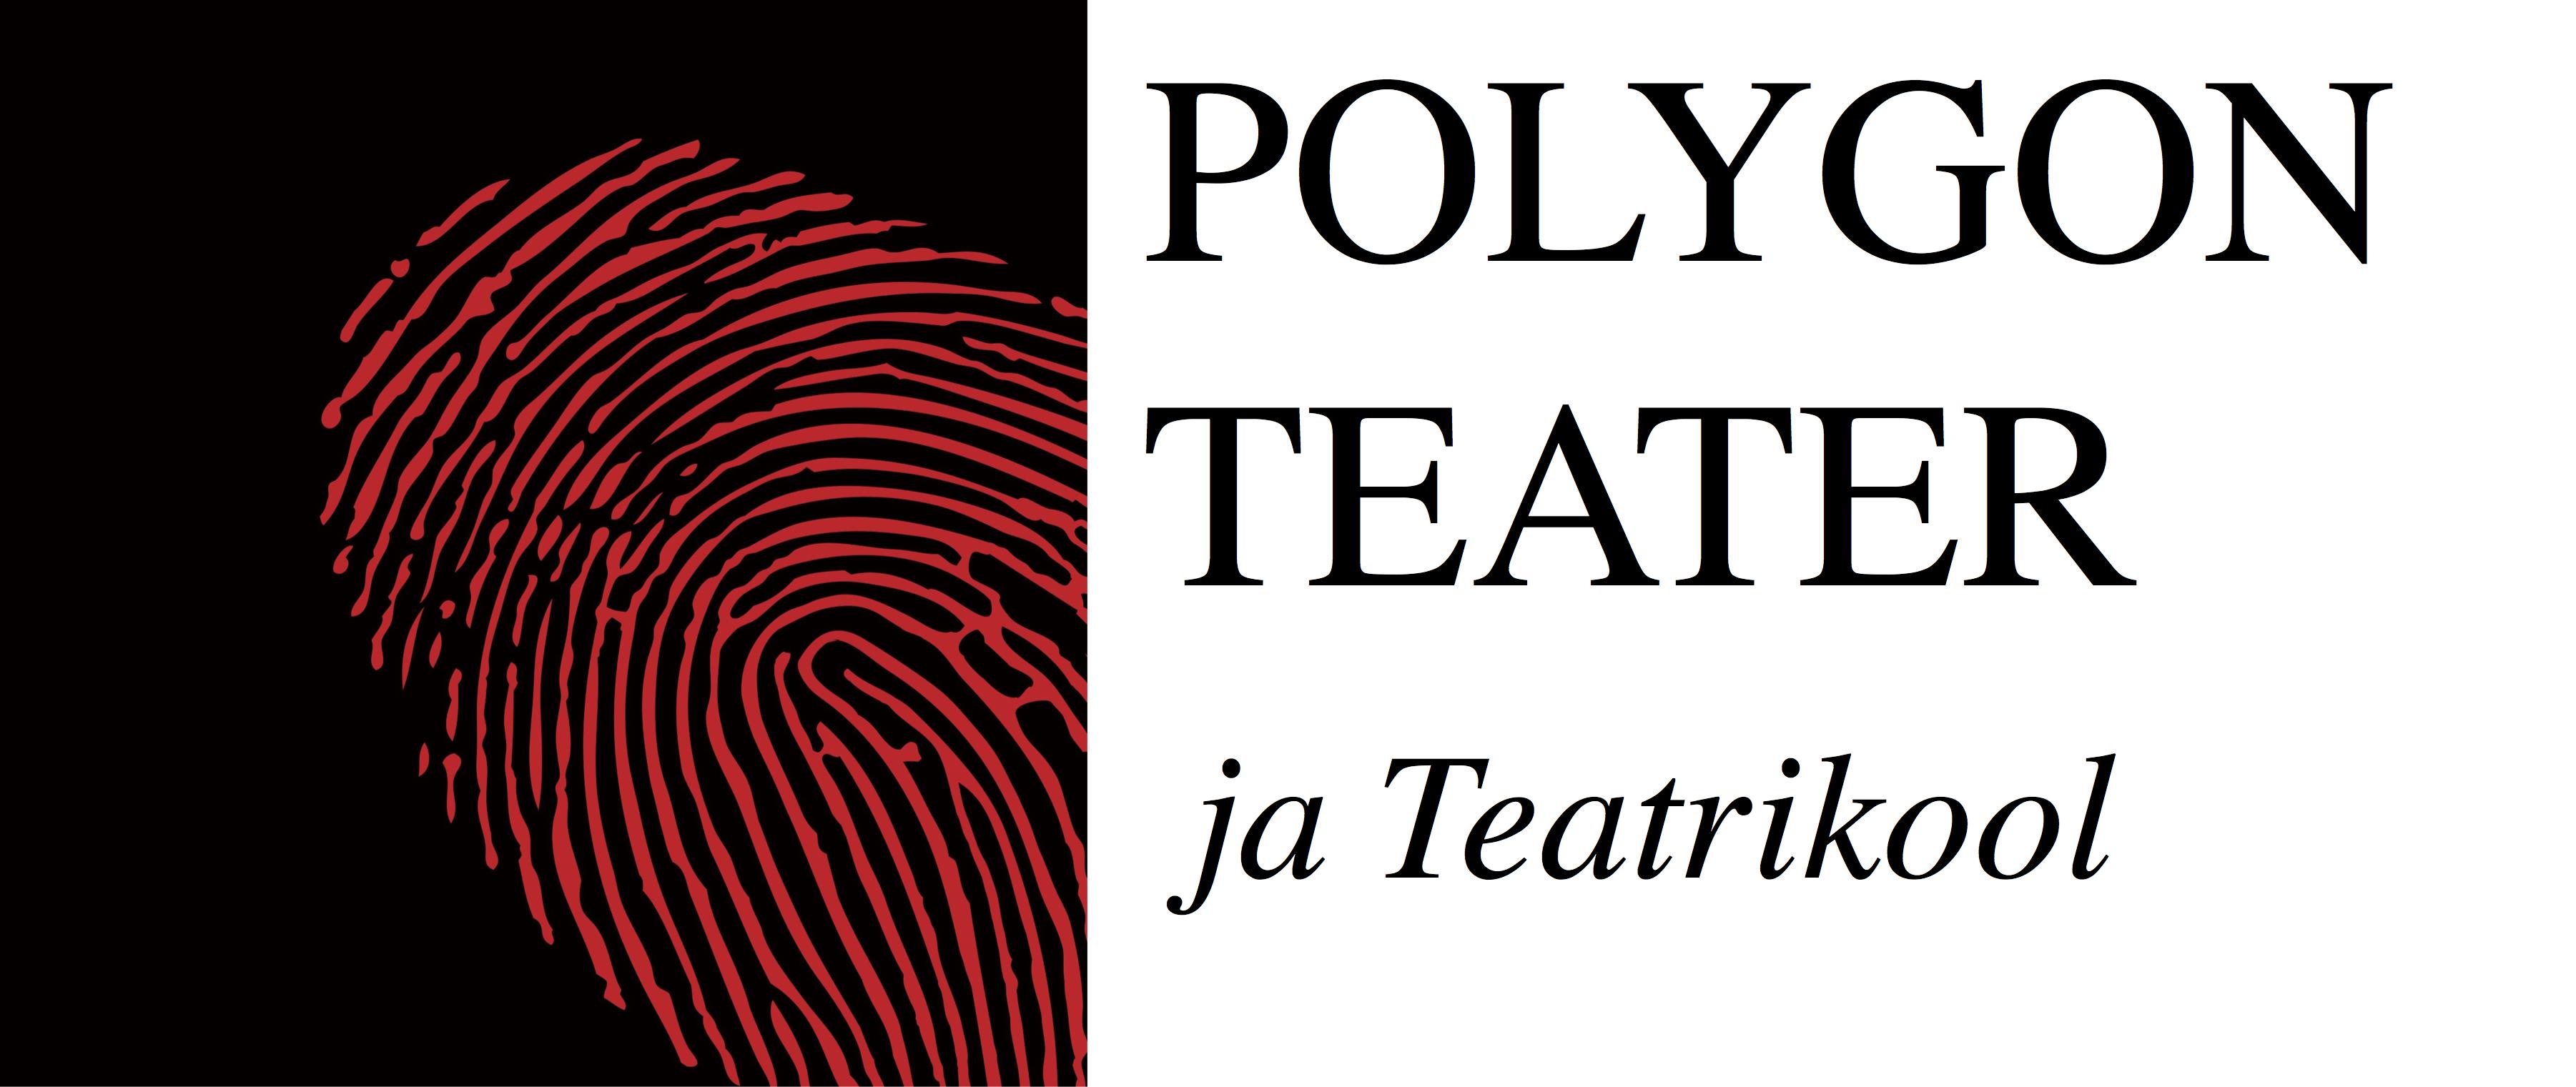 Polygon TeaterKool Logo